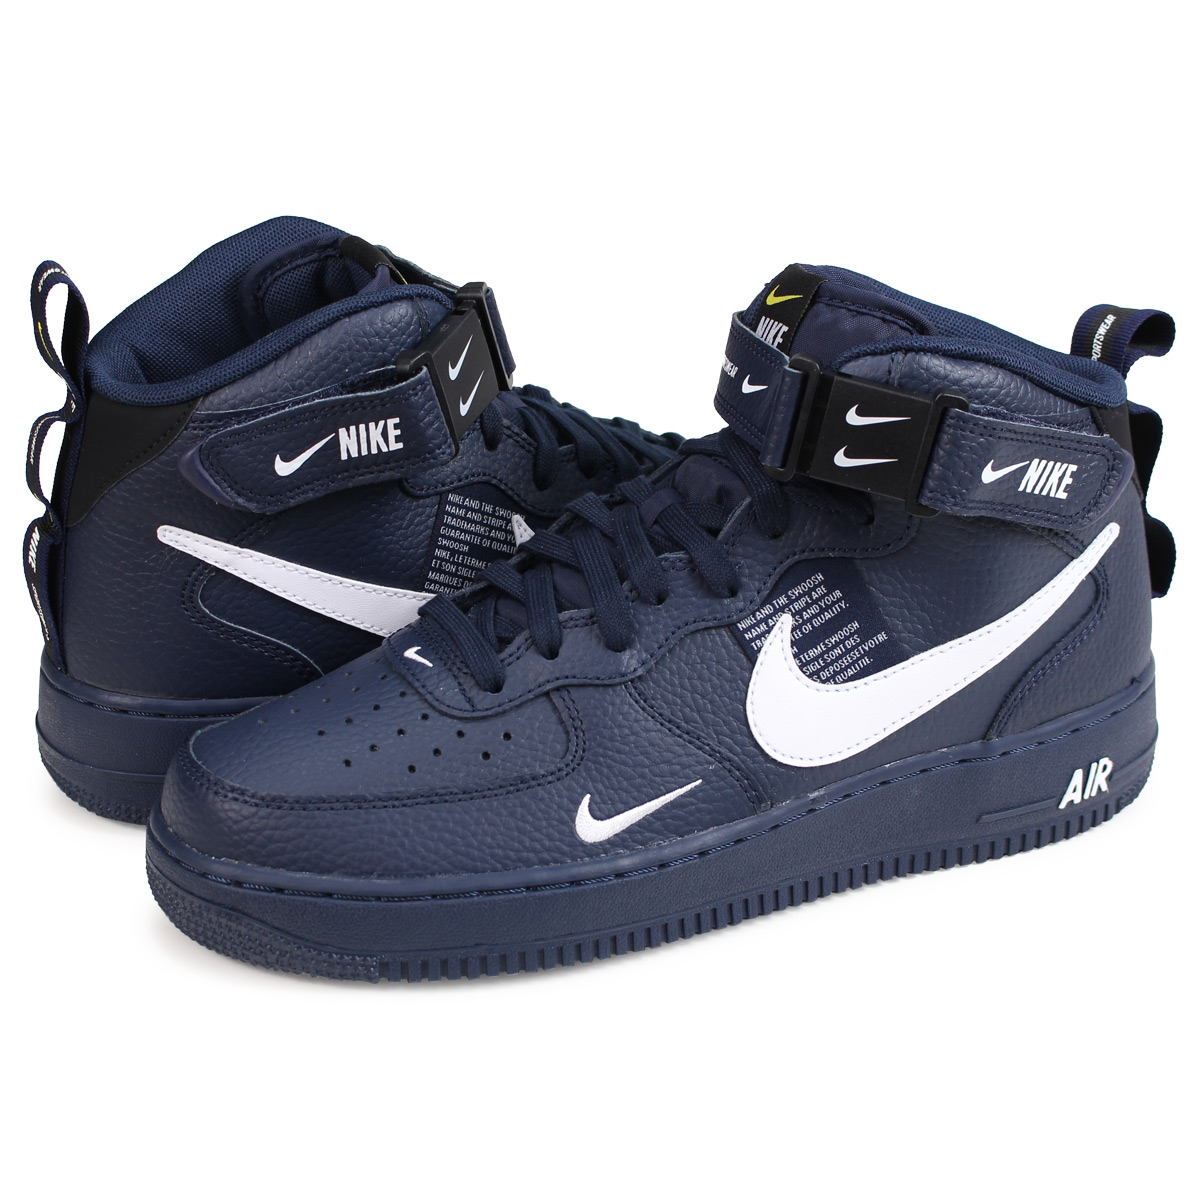 80e8b87ff08  brand NIKE getting high popularity from sneakers freak . Constant seller  model